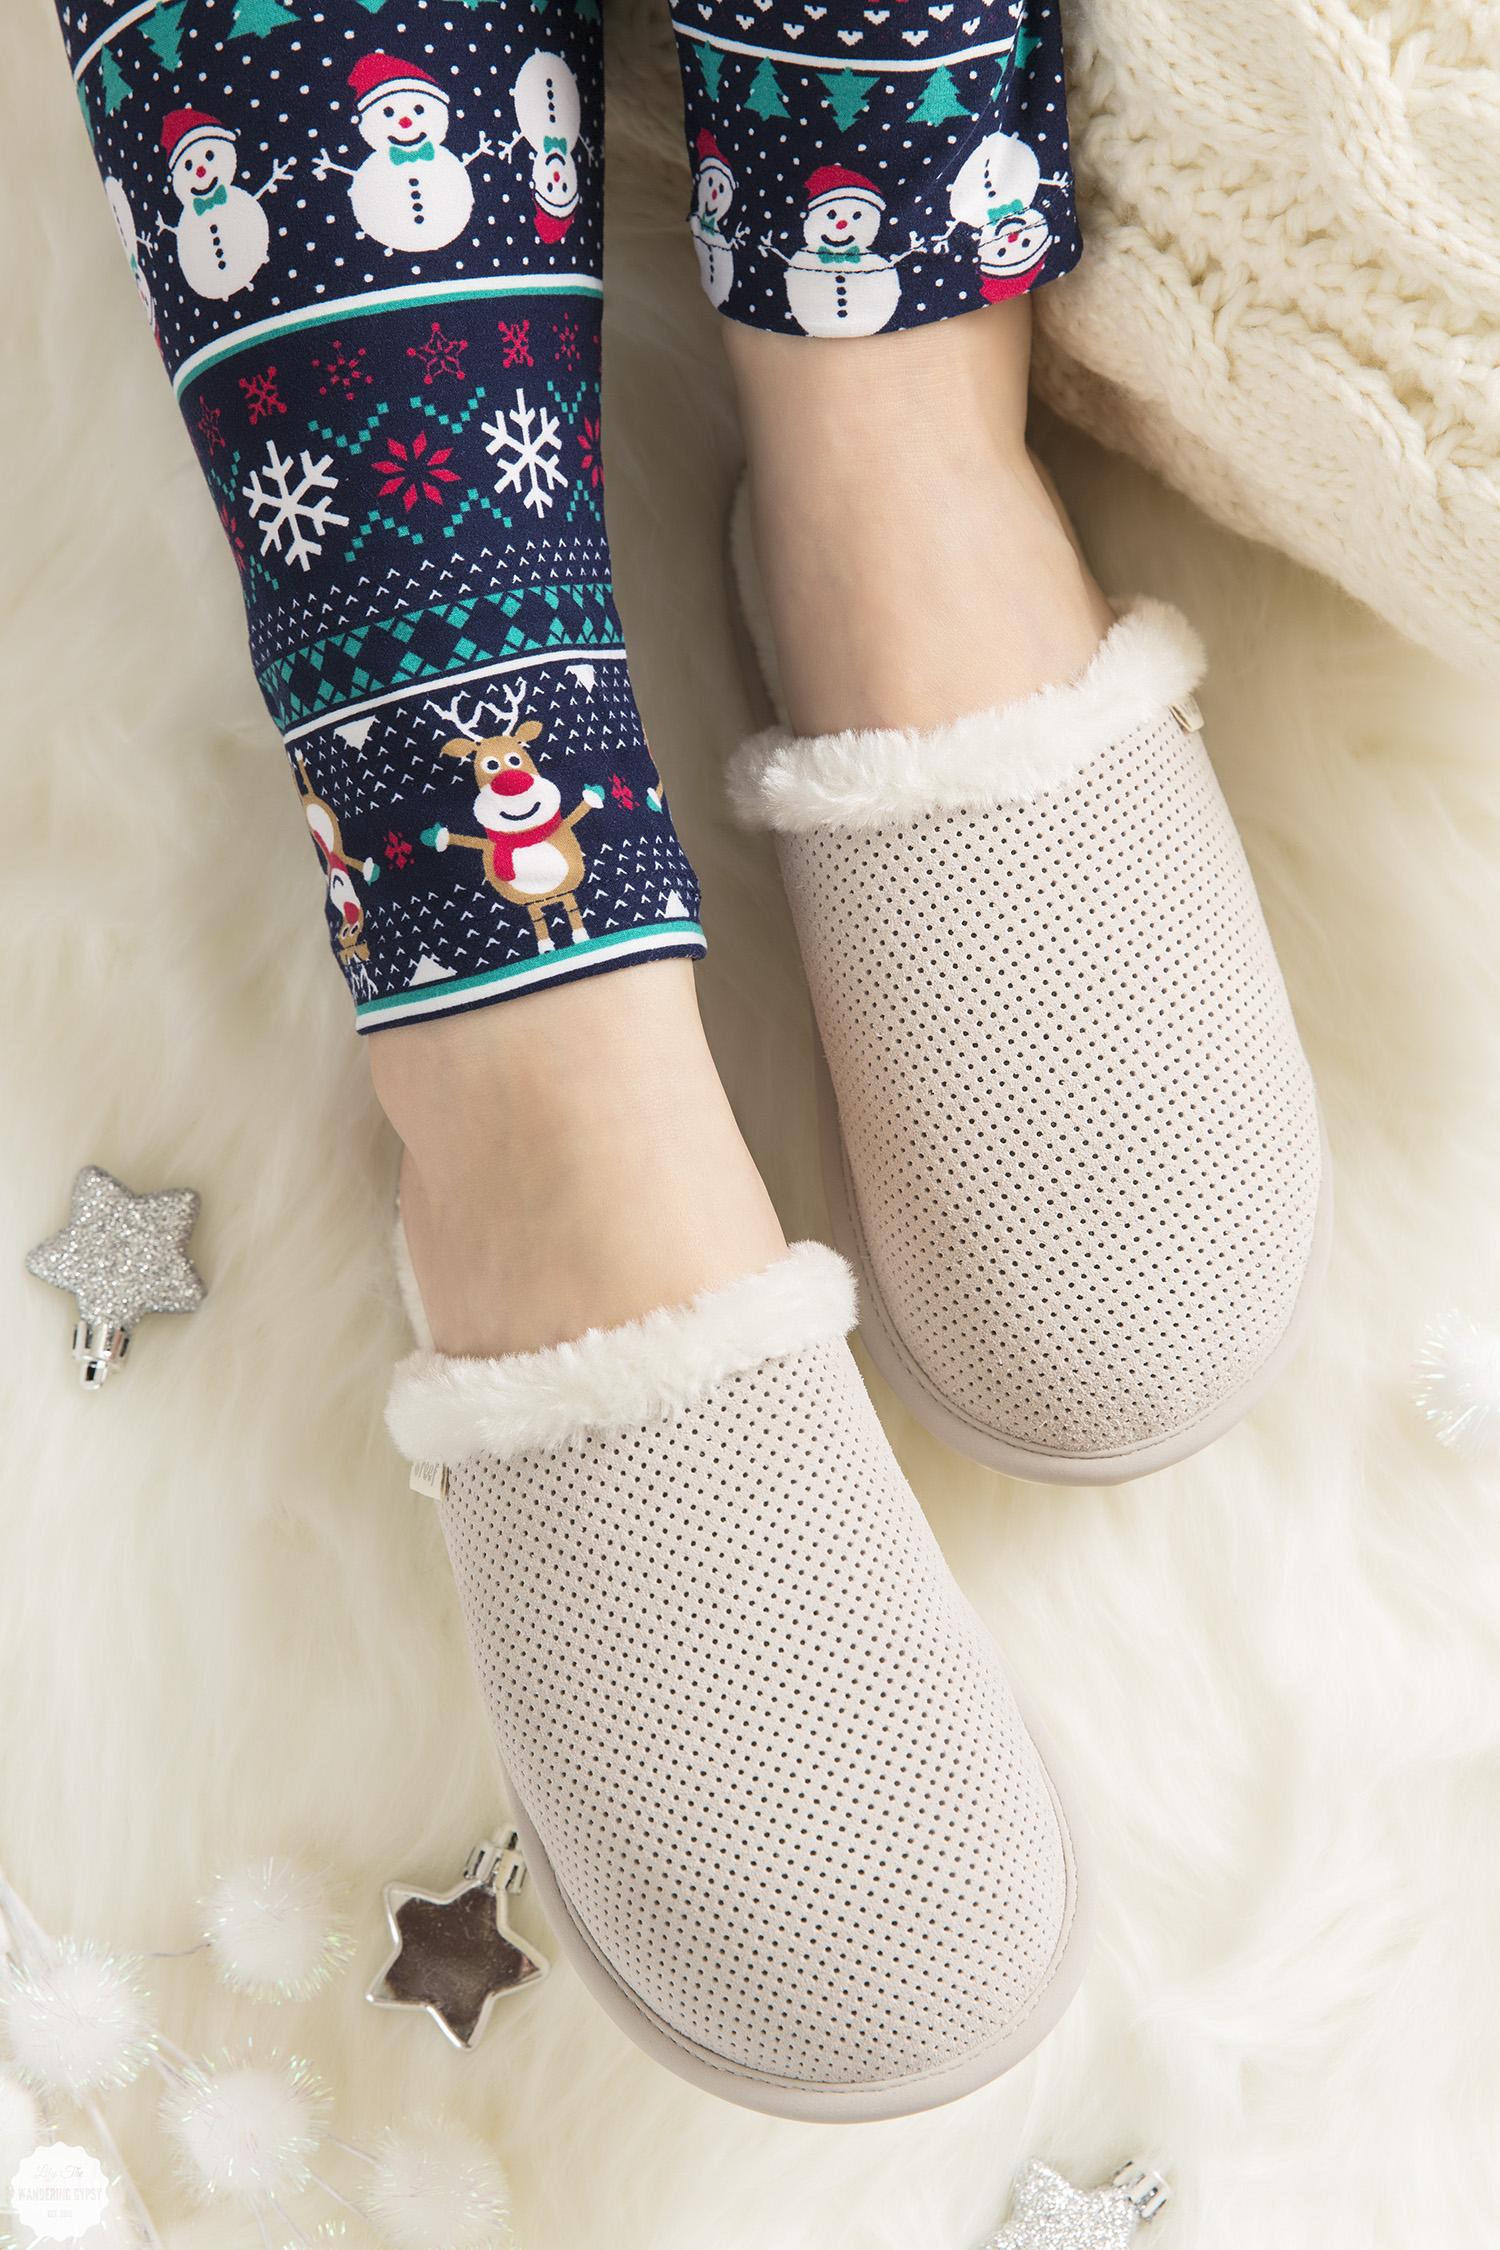 cute slippers!